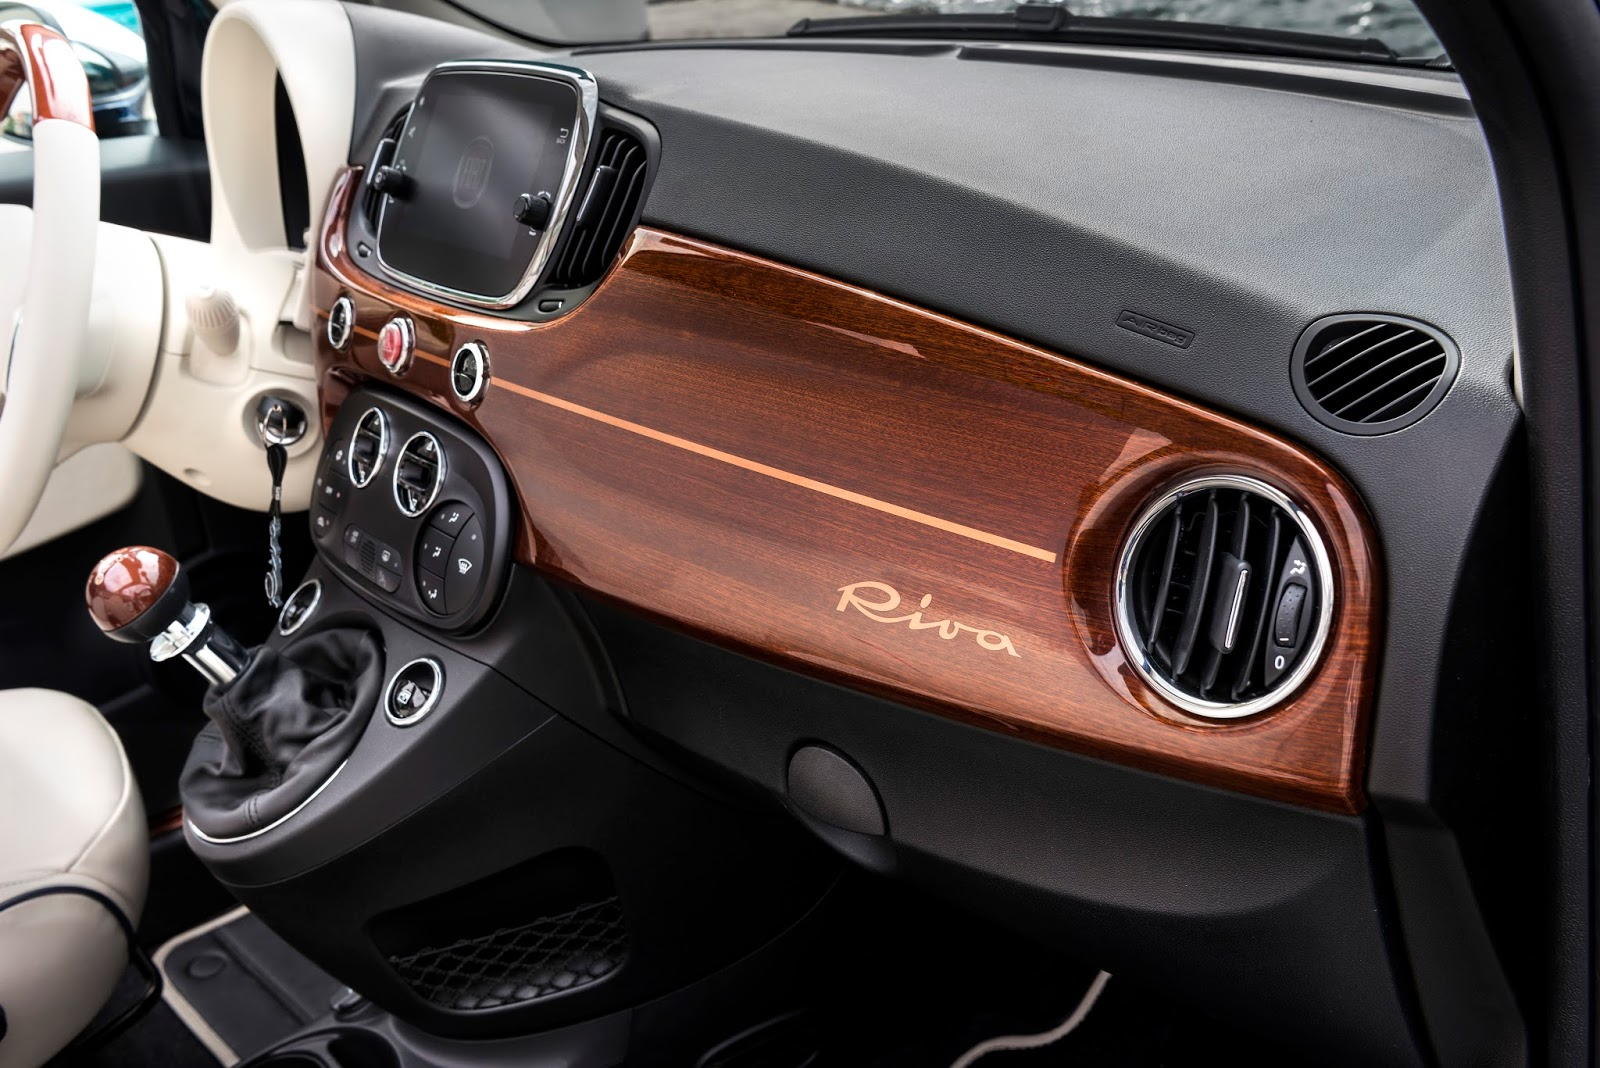 160627 Fiat 500 Riva 21 Fiat 500 Riva : Το κομψό έγινε και πολυτελές Fiat, Fiat 500, Fiat 500 Riva, Fiat 500C, Riva, supermini, videos